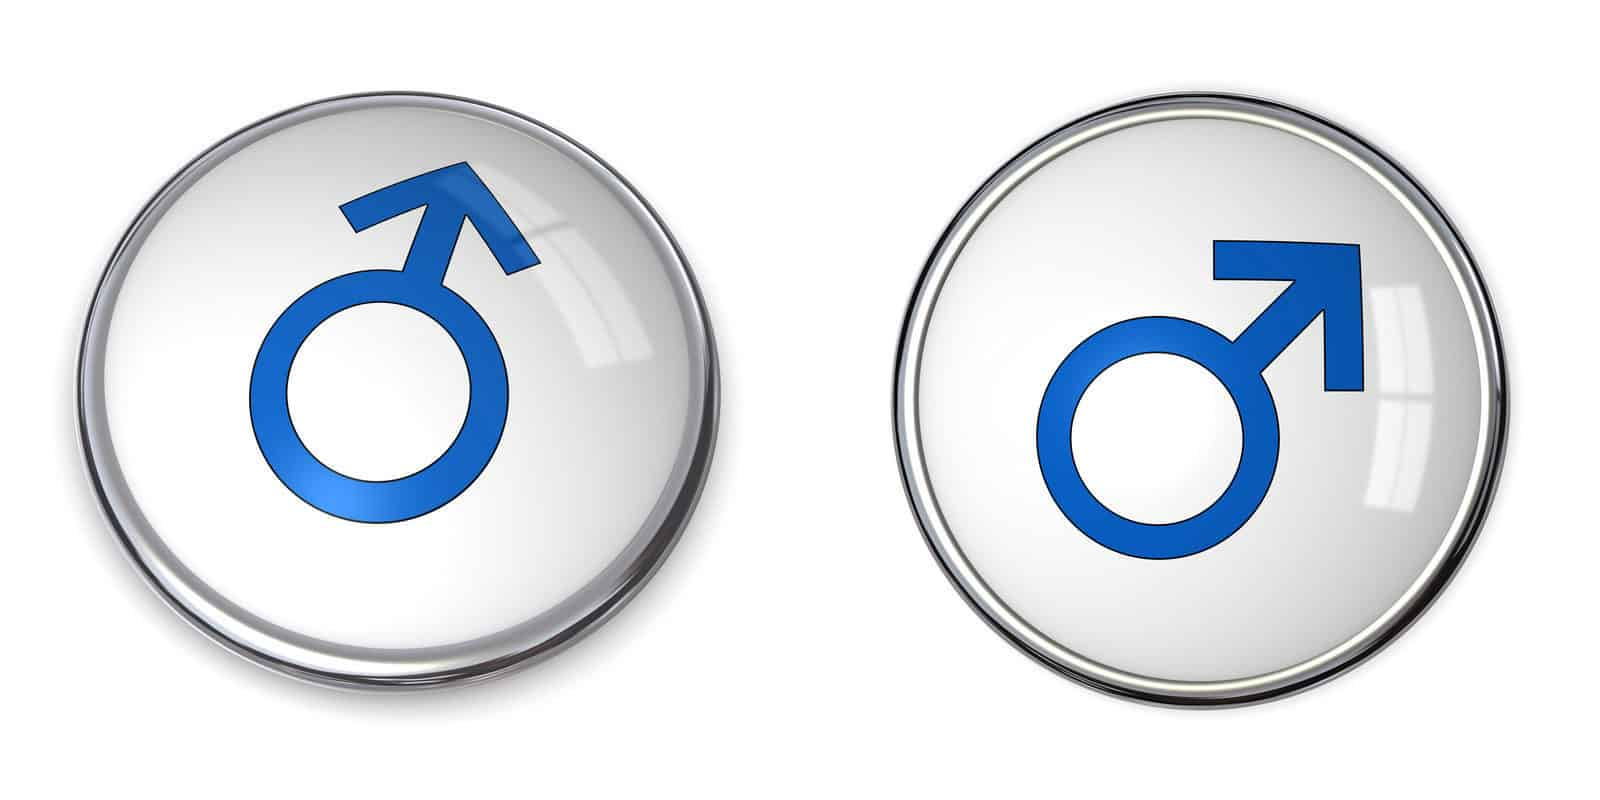 Male symbols on white surface